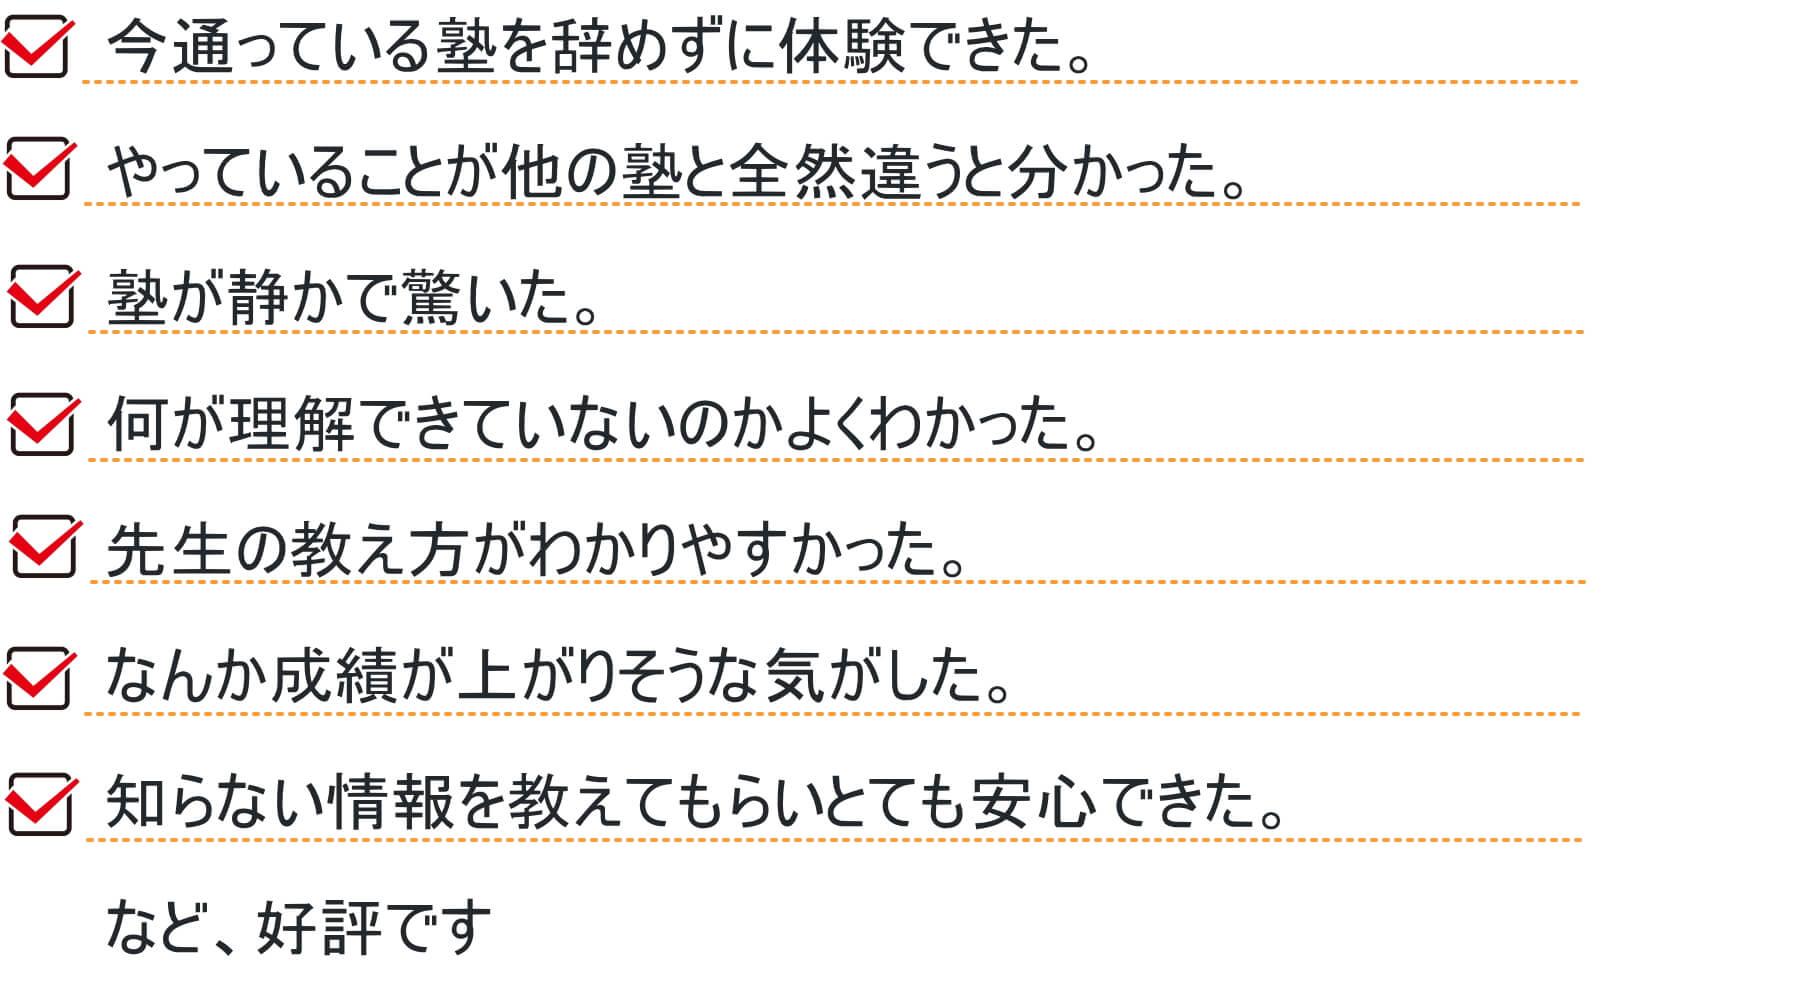 石井進学塾51点アップ 無料体験感想